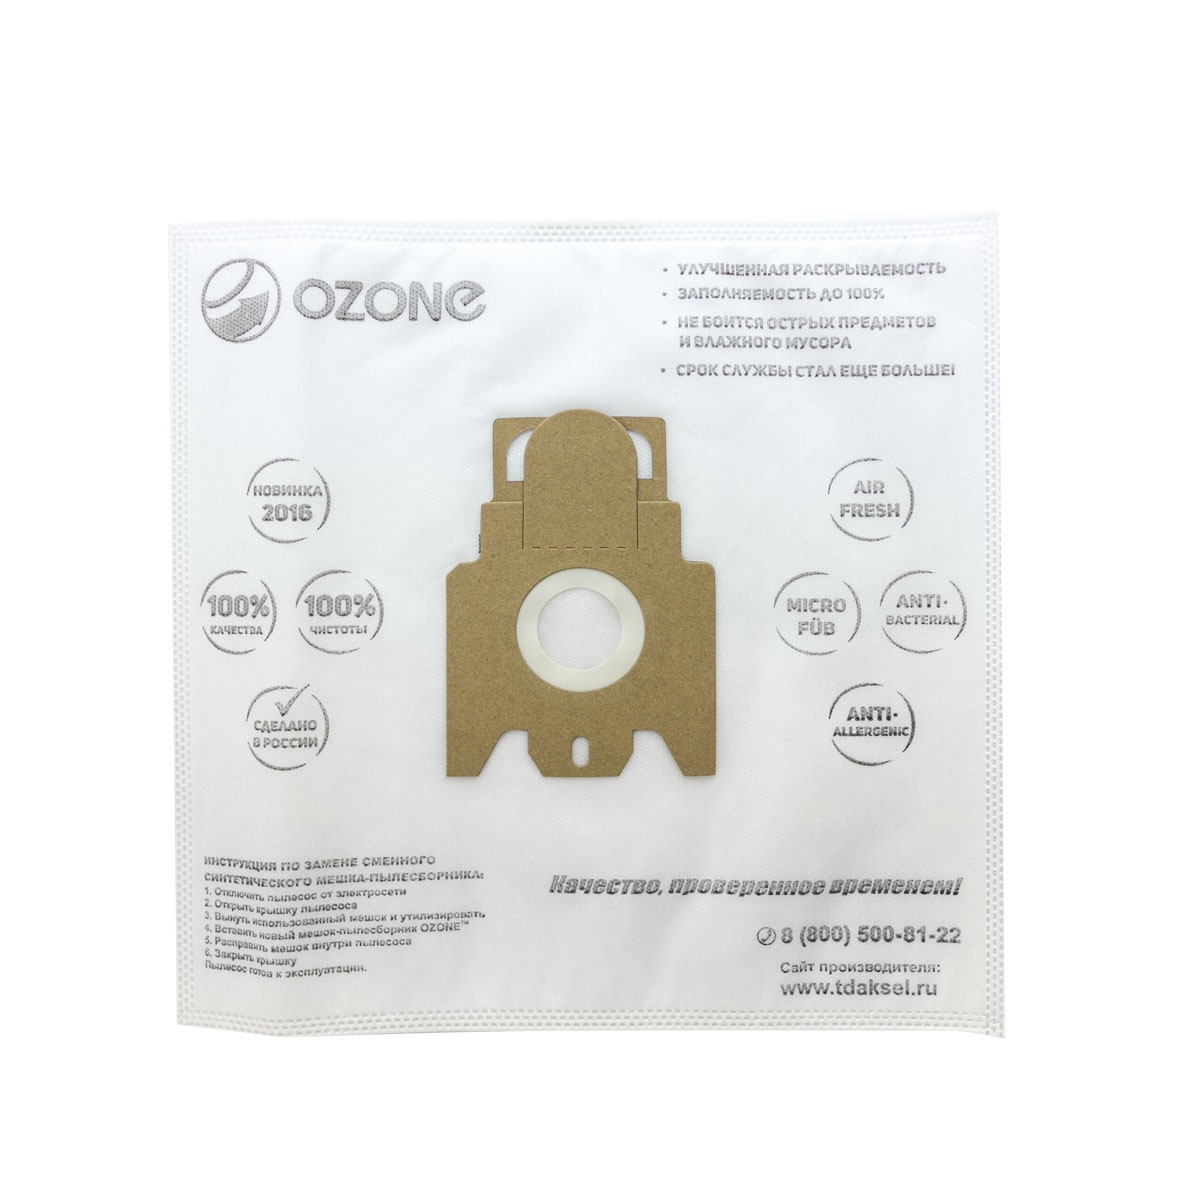 Пылесборник OZONE SE-28 Ozone